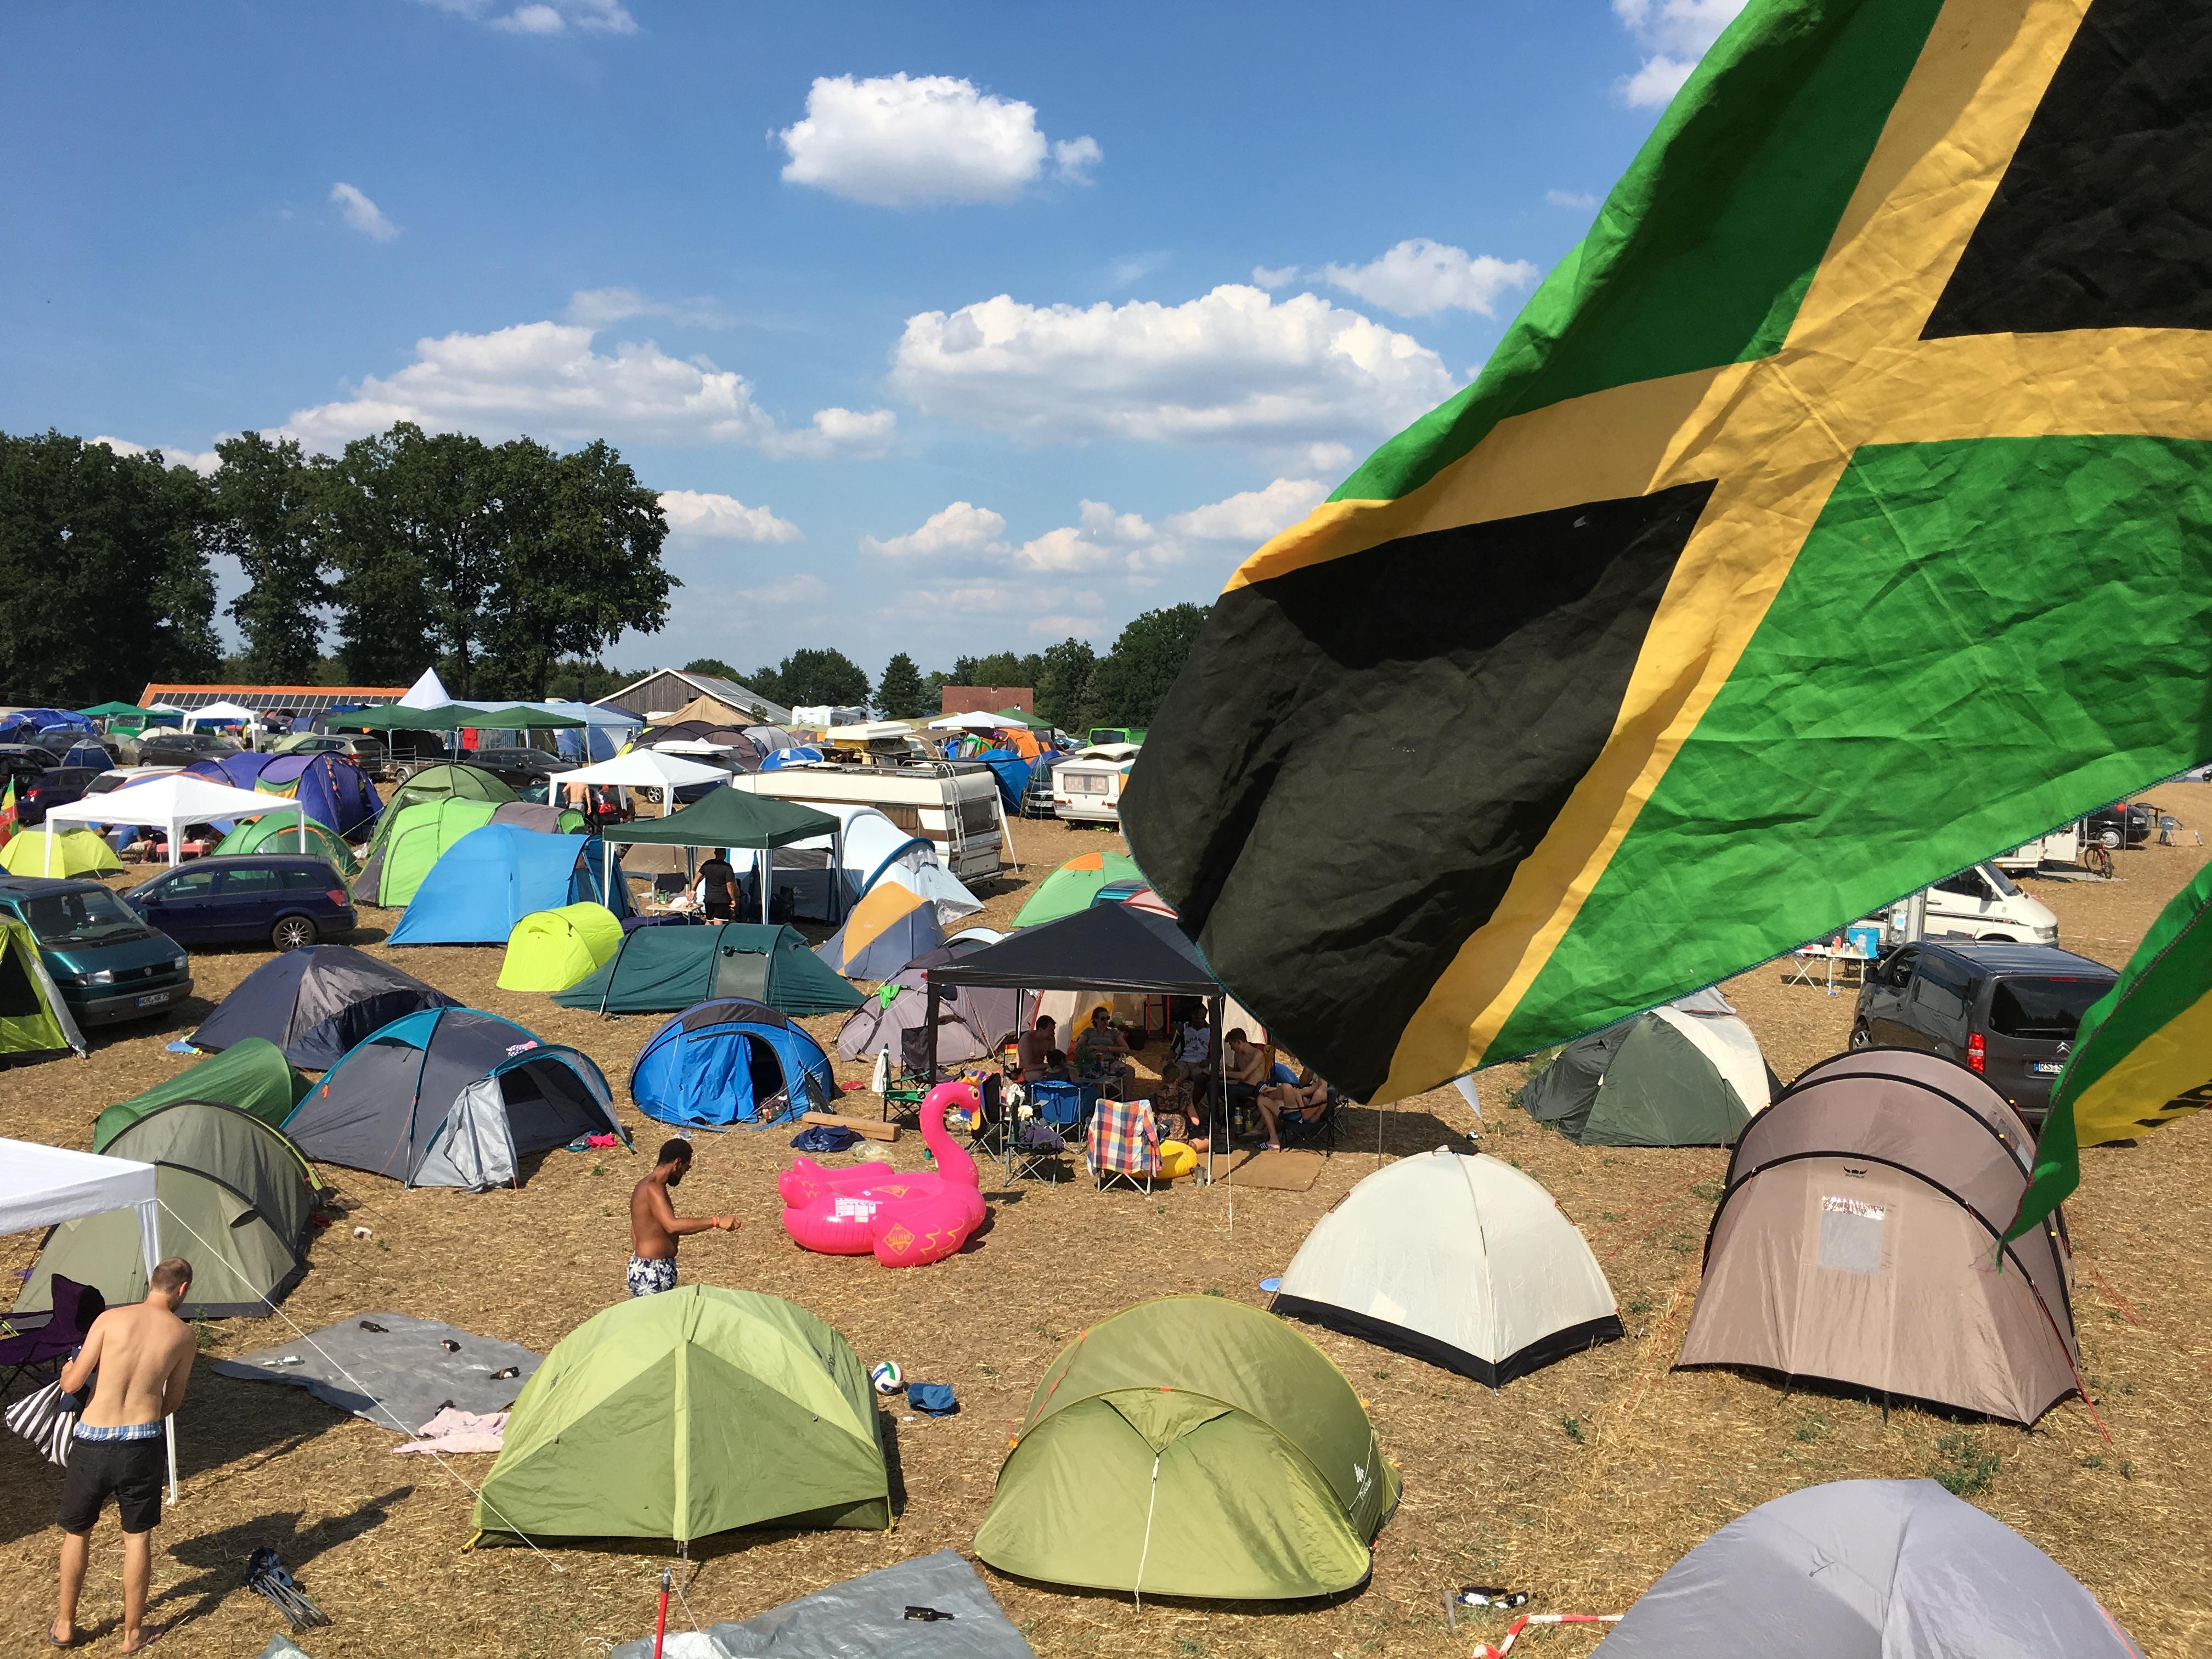 Reggae Jam 2018: Reggae Jam Festivalgelände (Bild: Wolfgang Alexander Meyer)